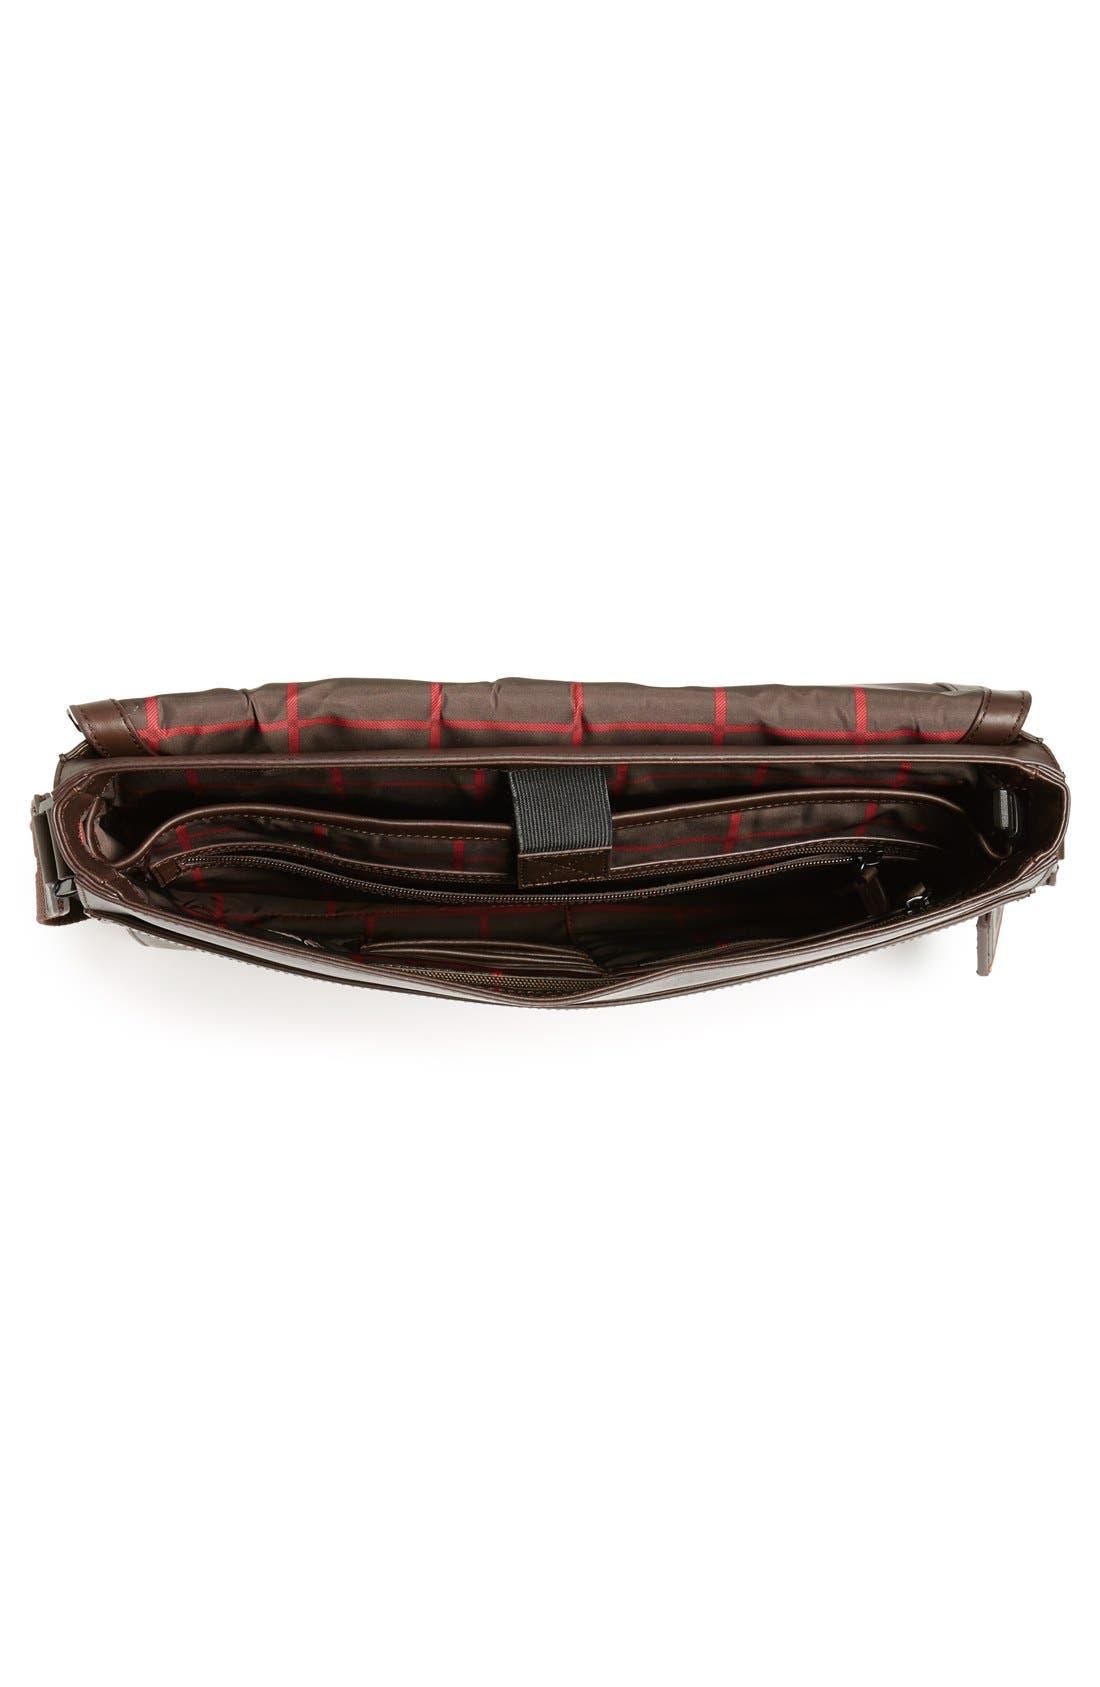 'Tolve' Leather Messenger Bag,                             Alternate thumbnail 4, color,                             210